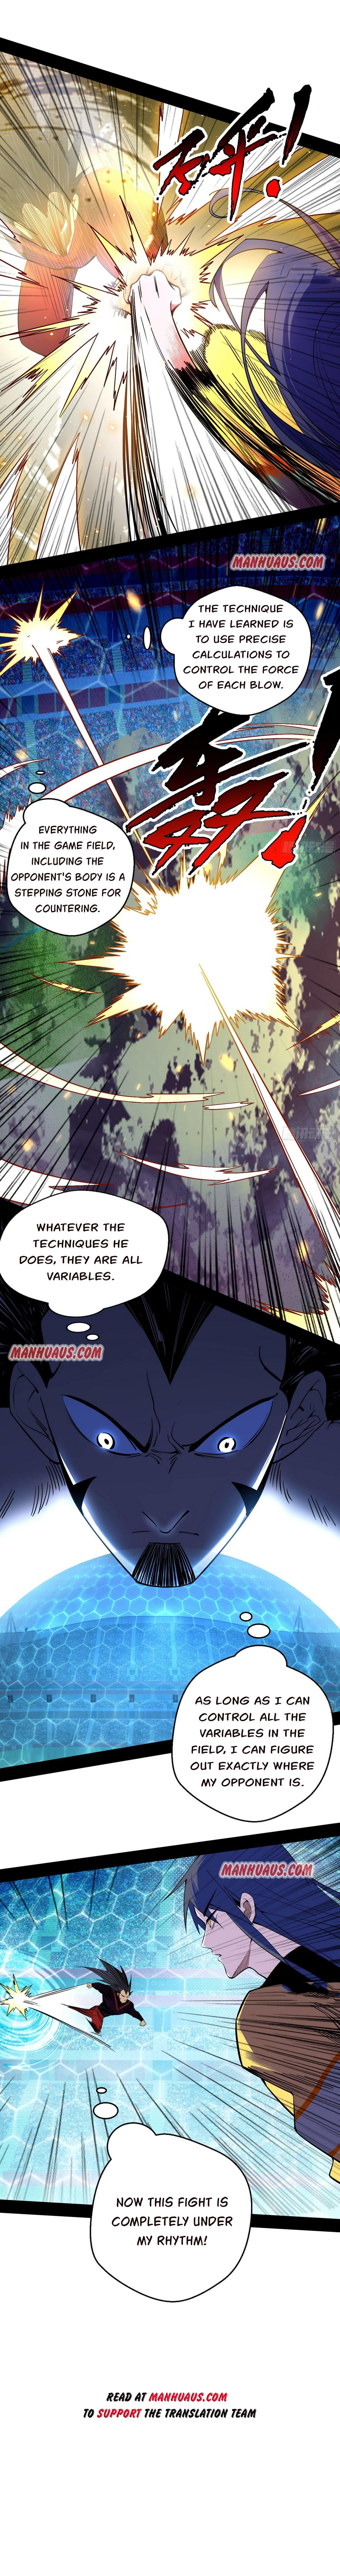 I'm An Evil God Chapter 171.1 page 5 - Mangakakalots.com